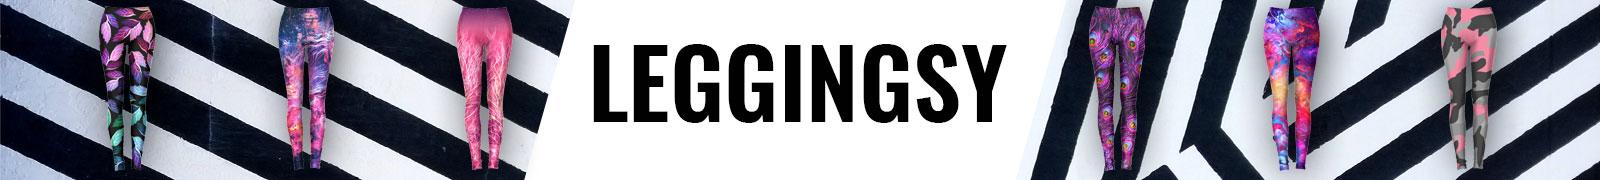 Leggingsy